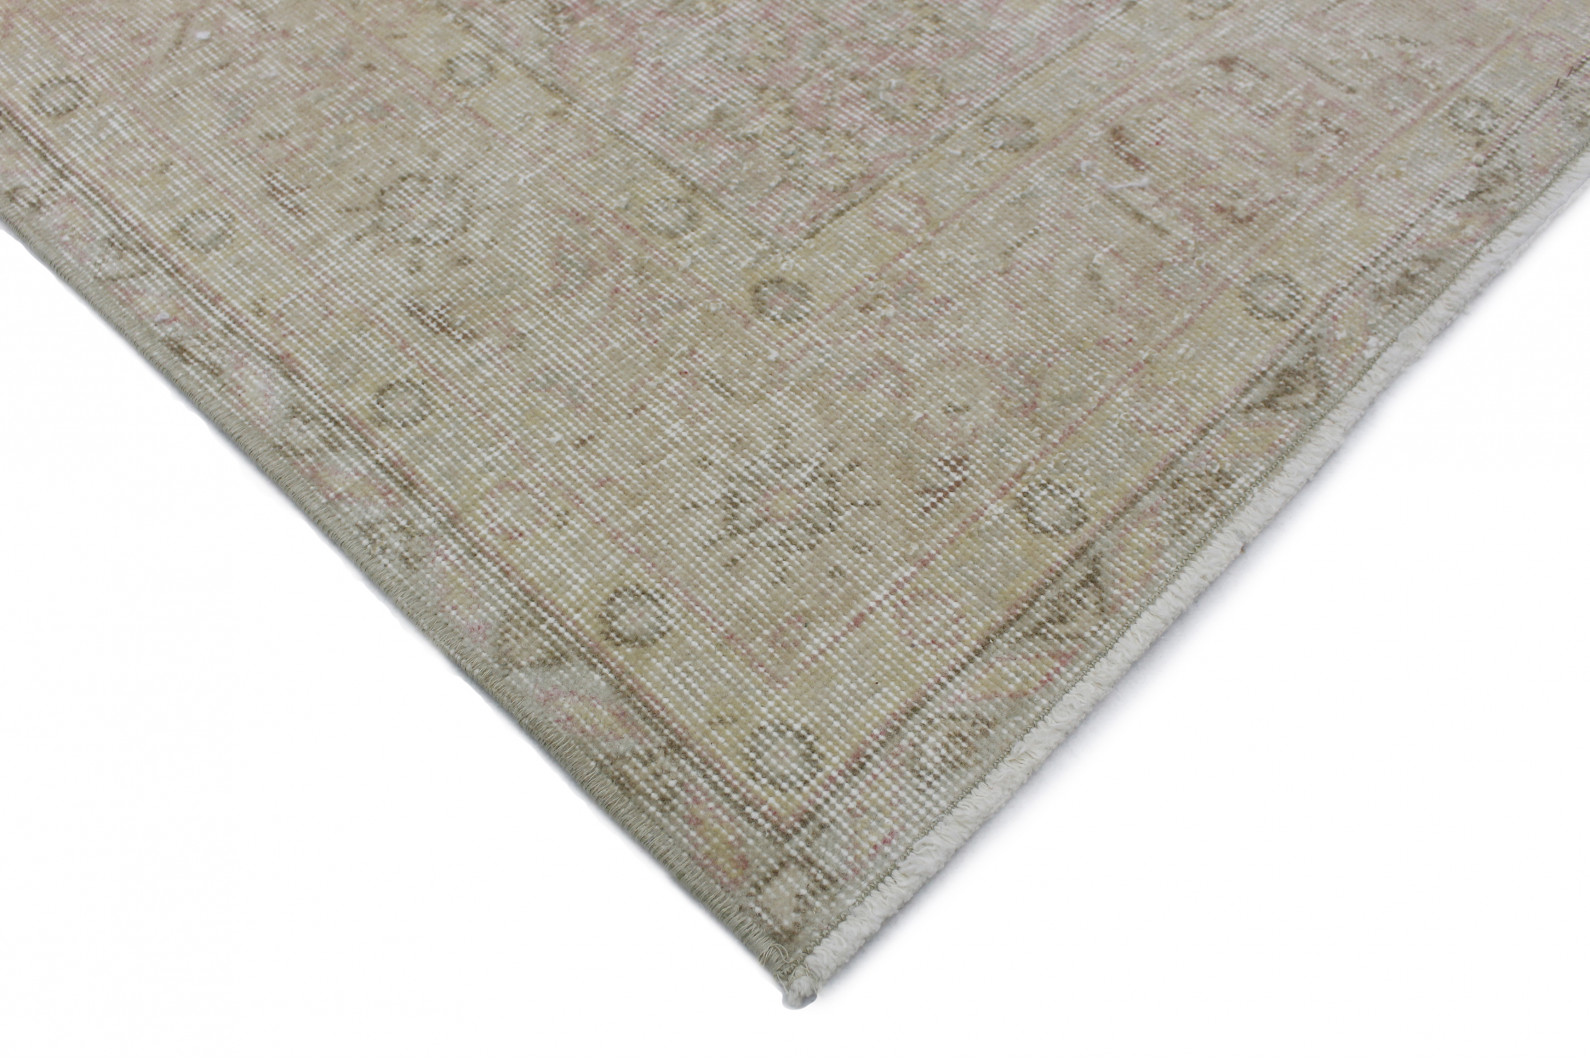 vintage teppich rosa in 290x160 1011 6003 bei carpetido. Black Bedroom Furniture Sets. Home Design Ideas